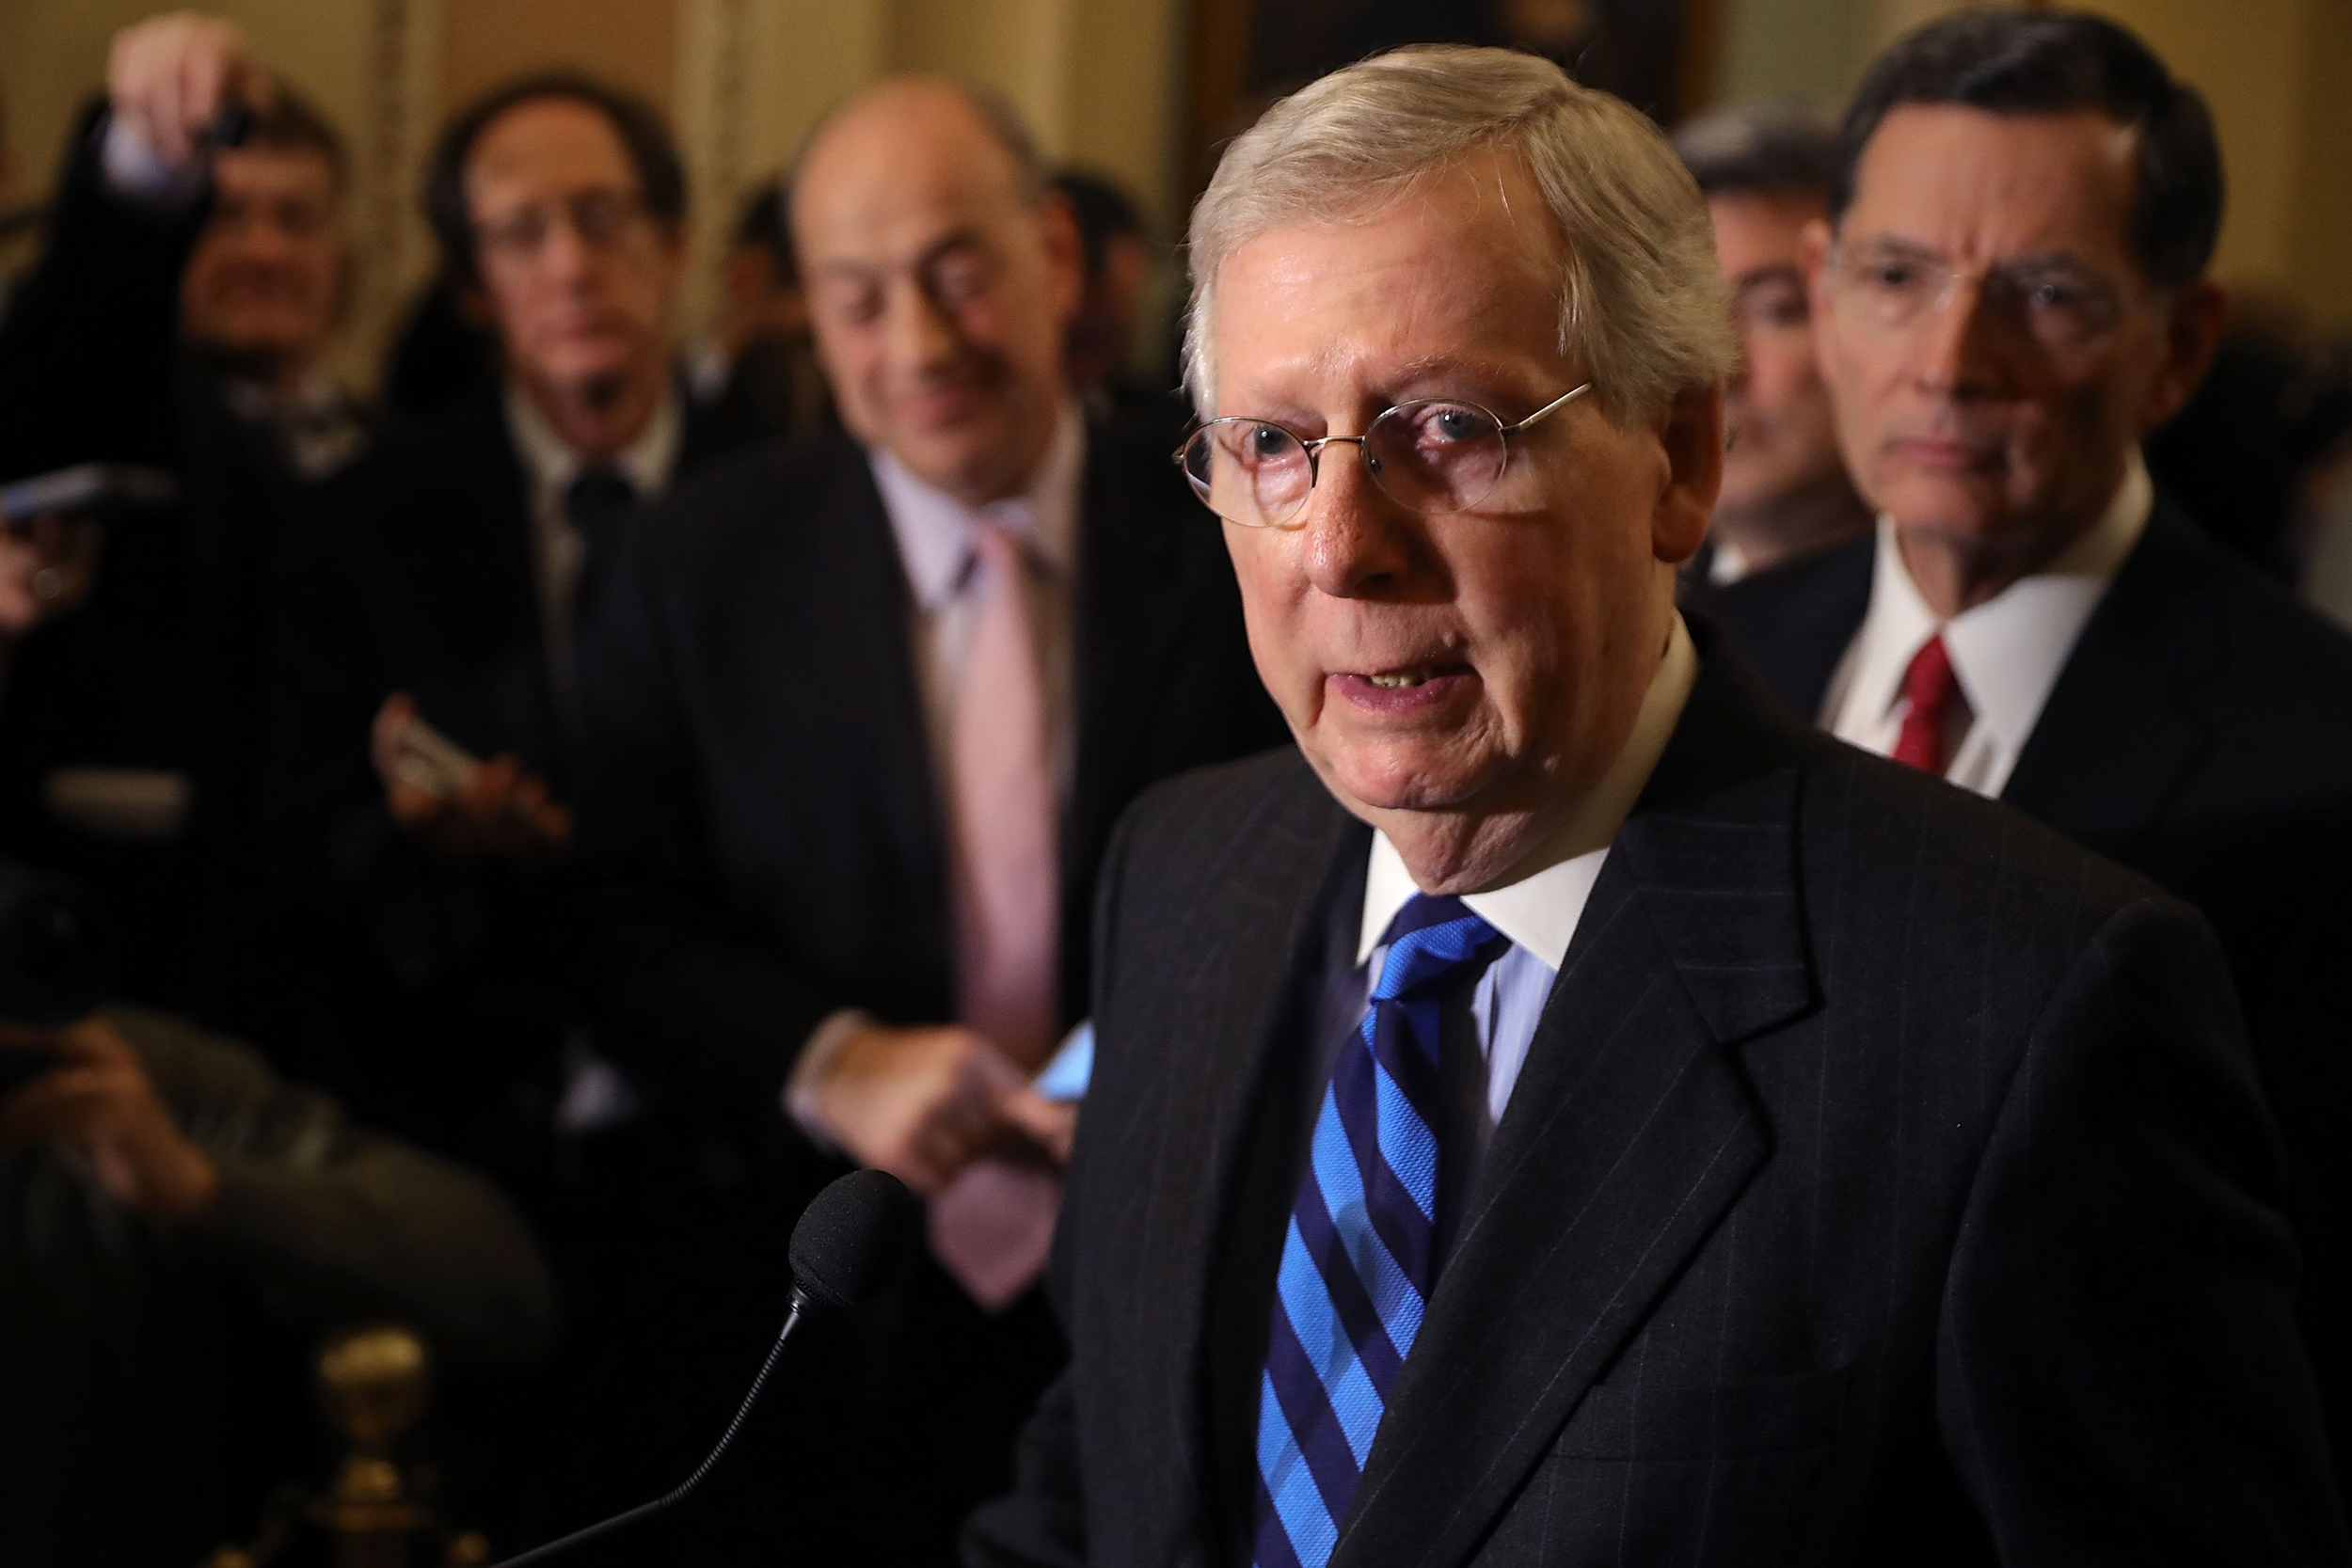 Senate leaders strike budget deal ahead of shutdown deadline